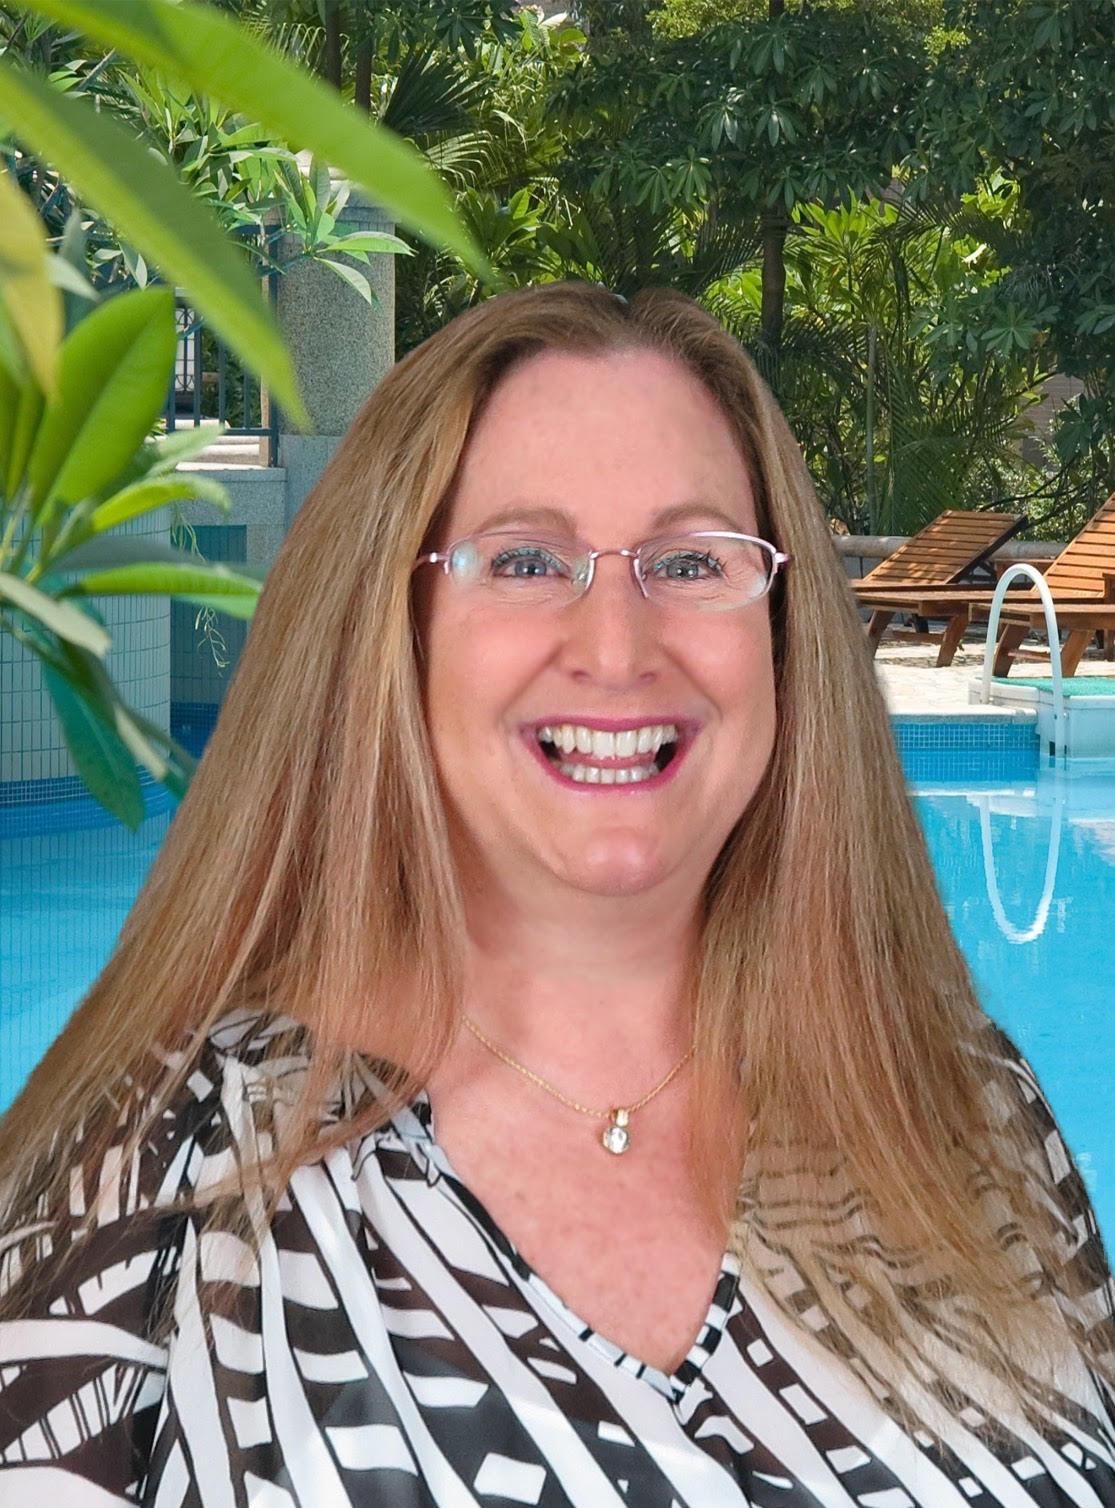 Laurieanne Morse - 352-457-5710  LaurieanneMorse.Realtor@gmail.com